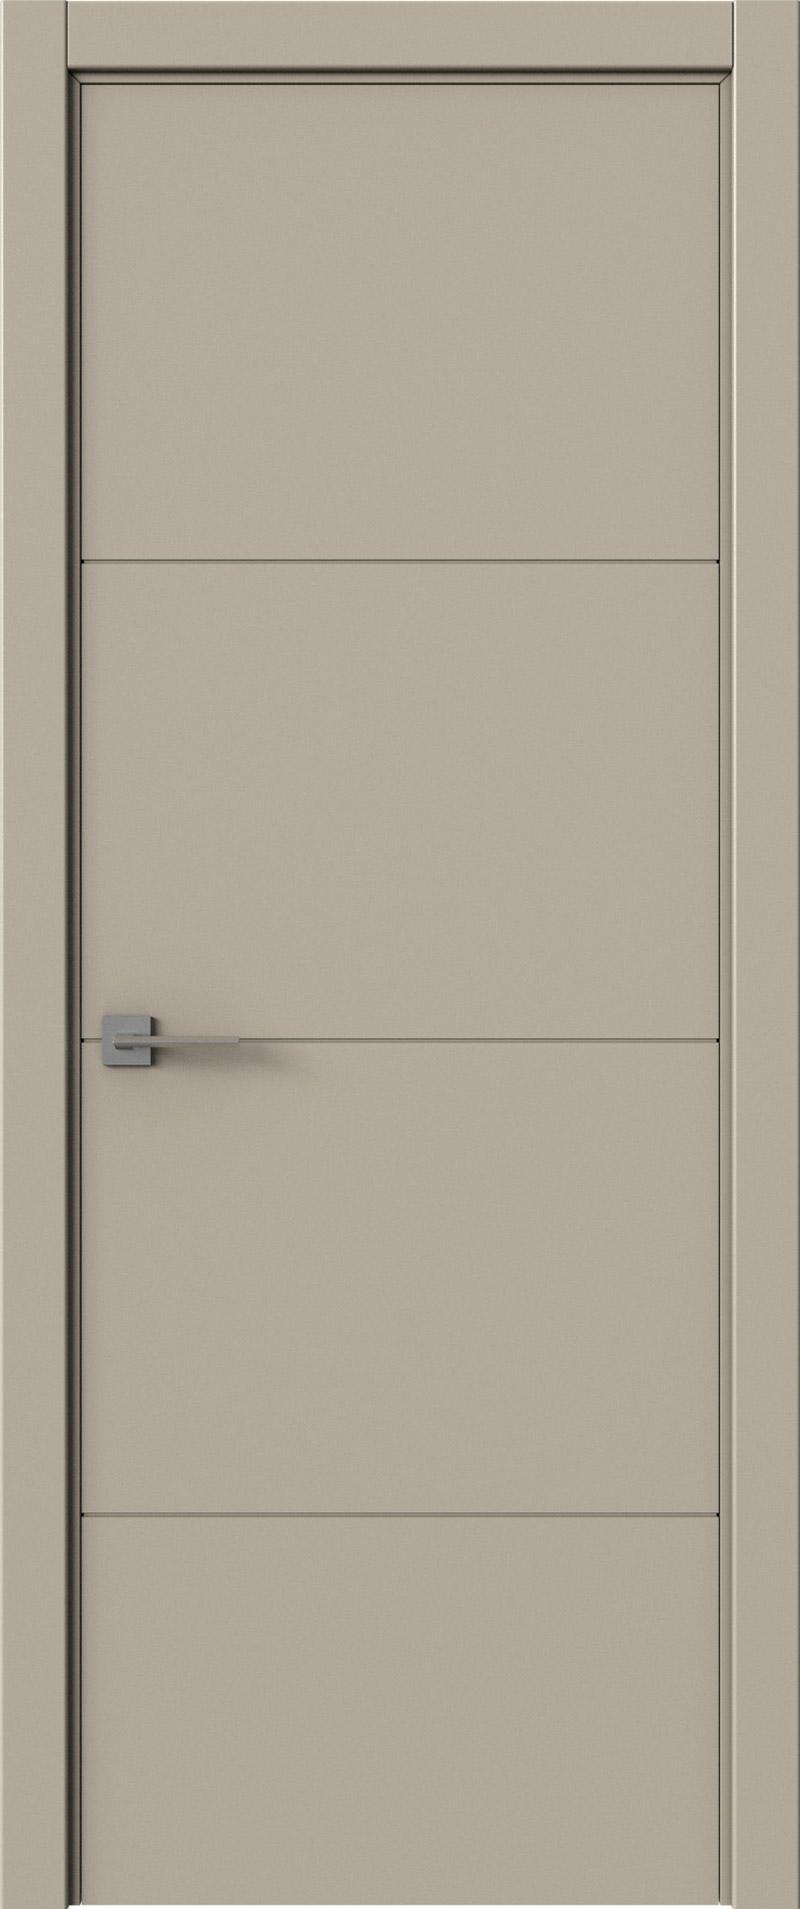 Tivoli Г-2 цвет - Серо-оливковая эмаль (RAL 7032) Без стекла (ДГ)